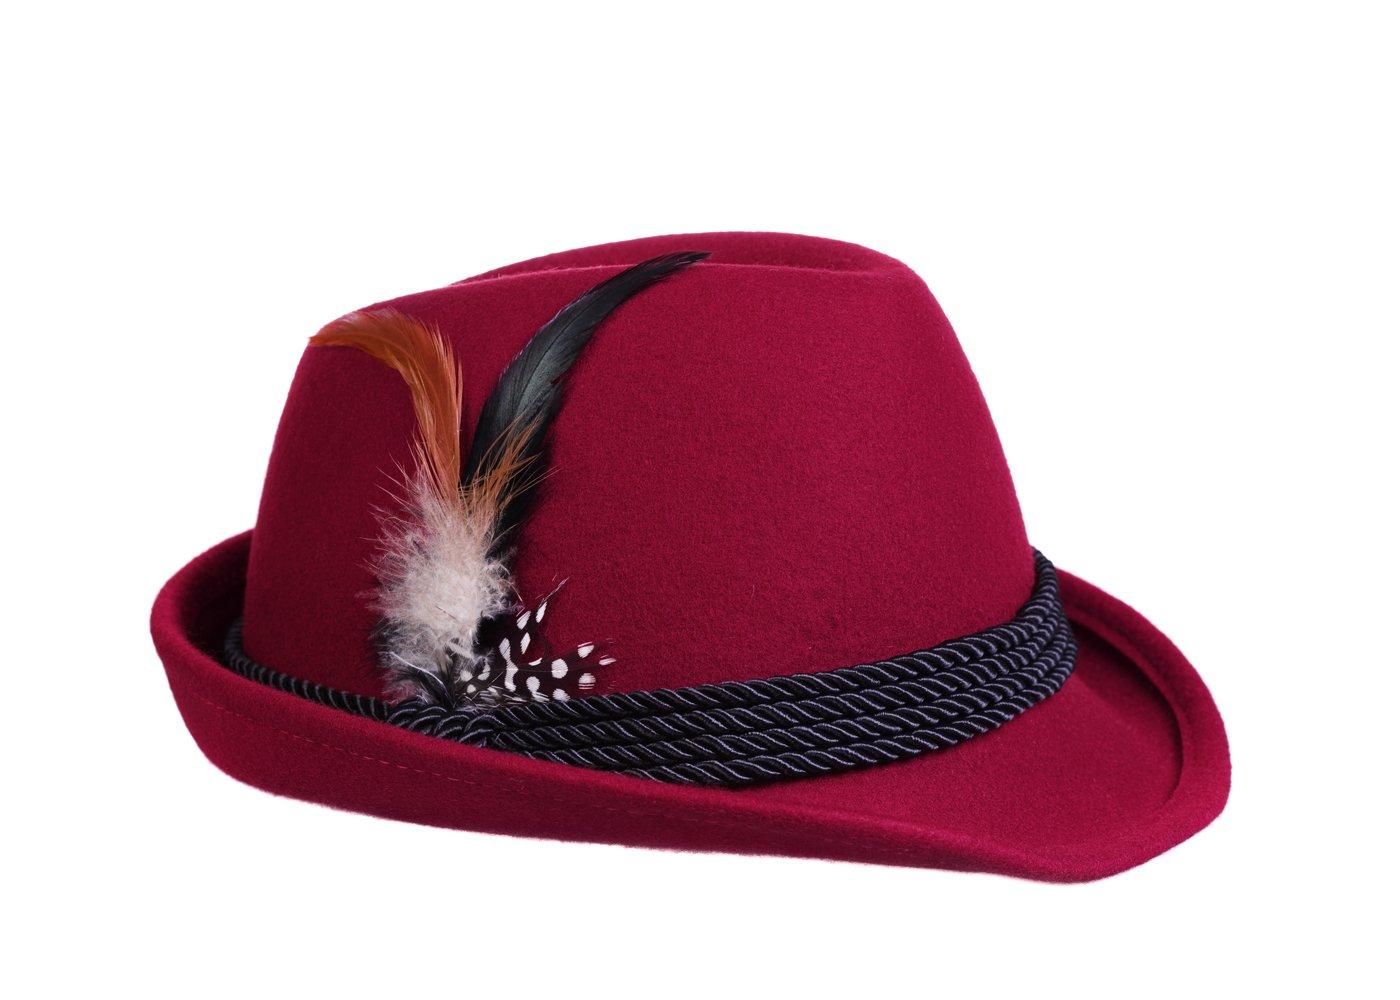 Alpine Holiday Oktoberfest Wool Bavarian Fedora Hat - Red - Large (7 1/4 to 7 3/8)